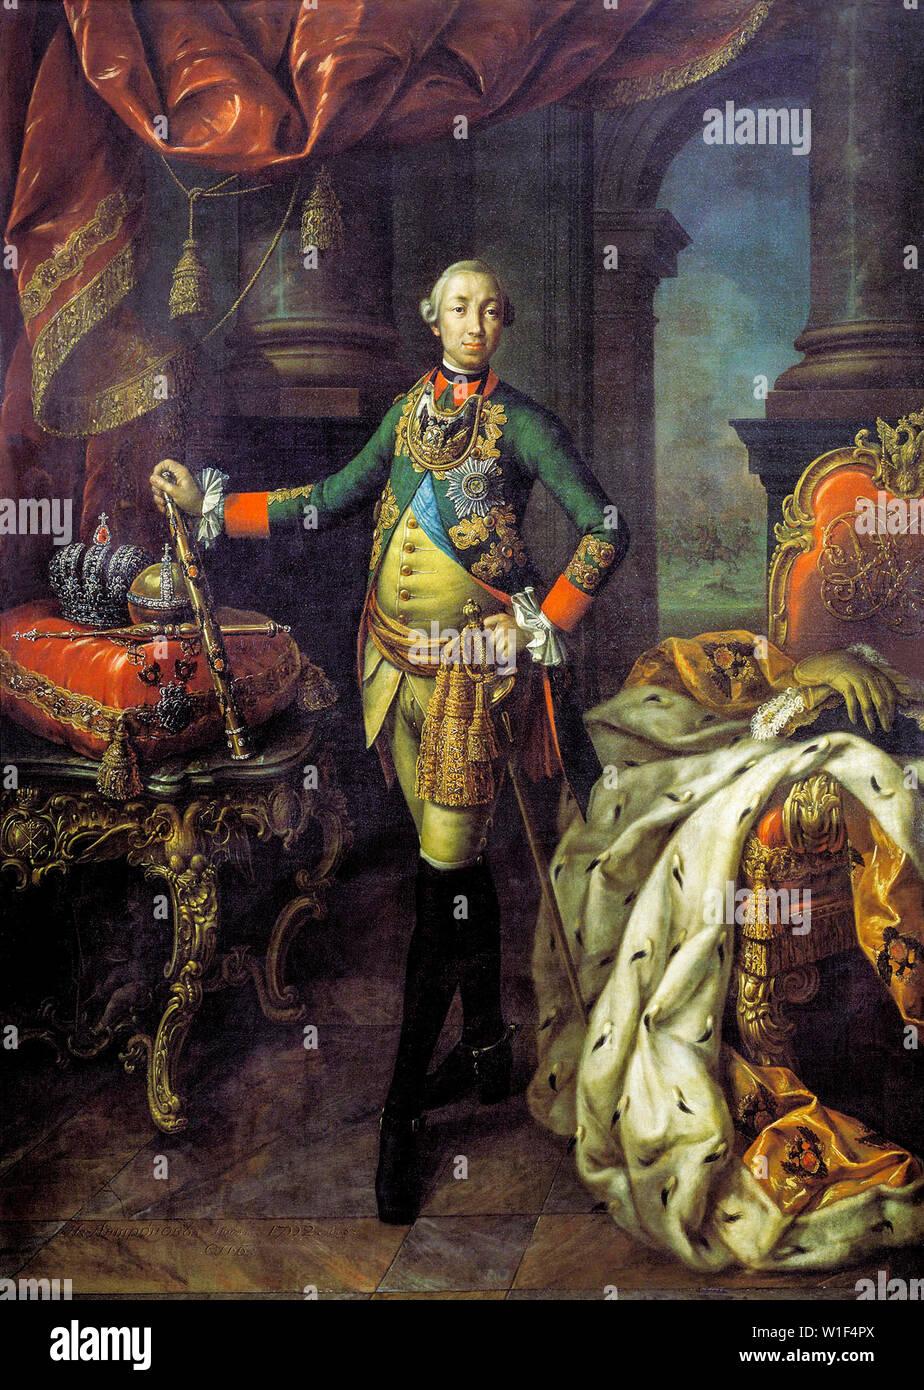 Alexsey Antropov, Peter III, Emperor of Russia, 1728-1762, portrait painting, 1762 - Stock Image